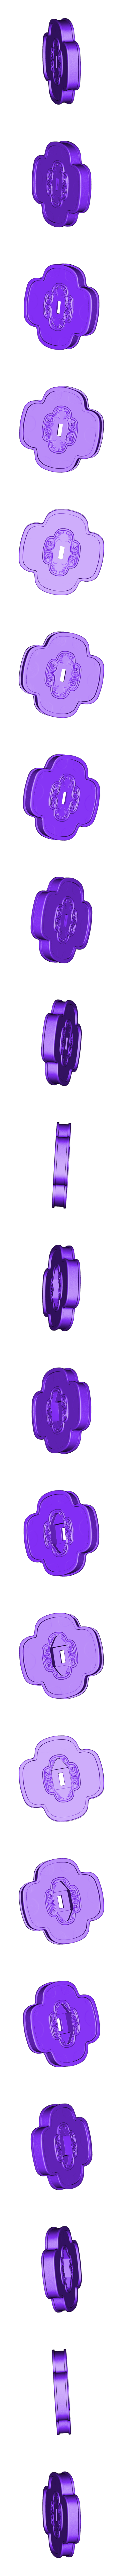 Katana01_2.stl Download free STL file katana 01 • 3D printable template, Dynastinae